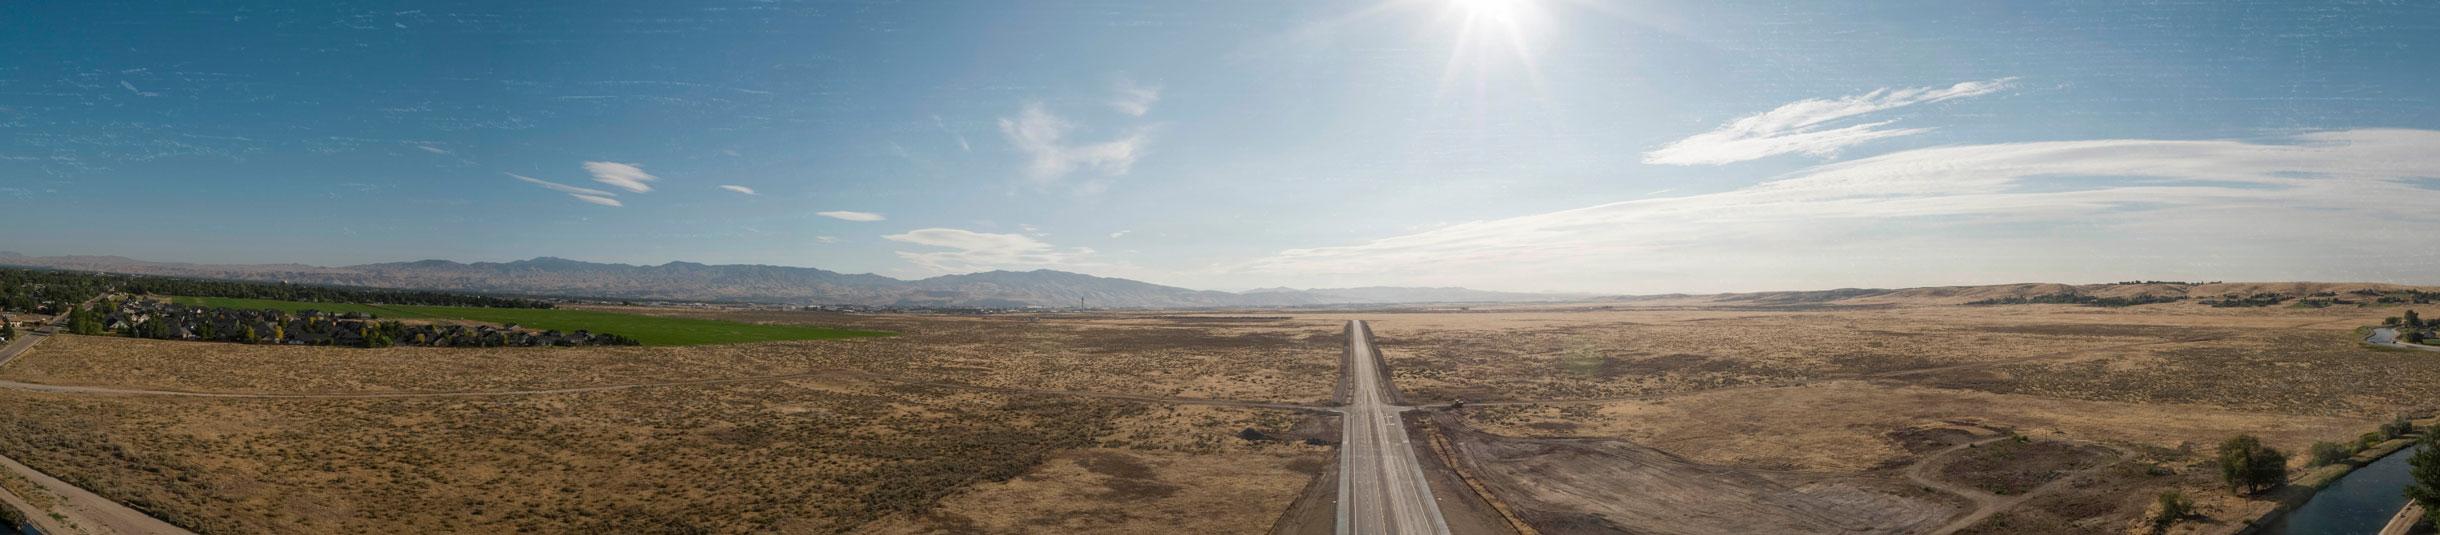 Locale-Website-Landscape-DesertPano.jpg